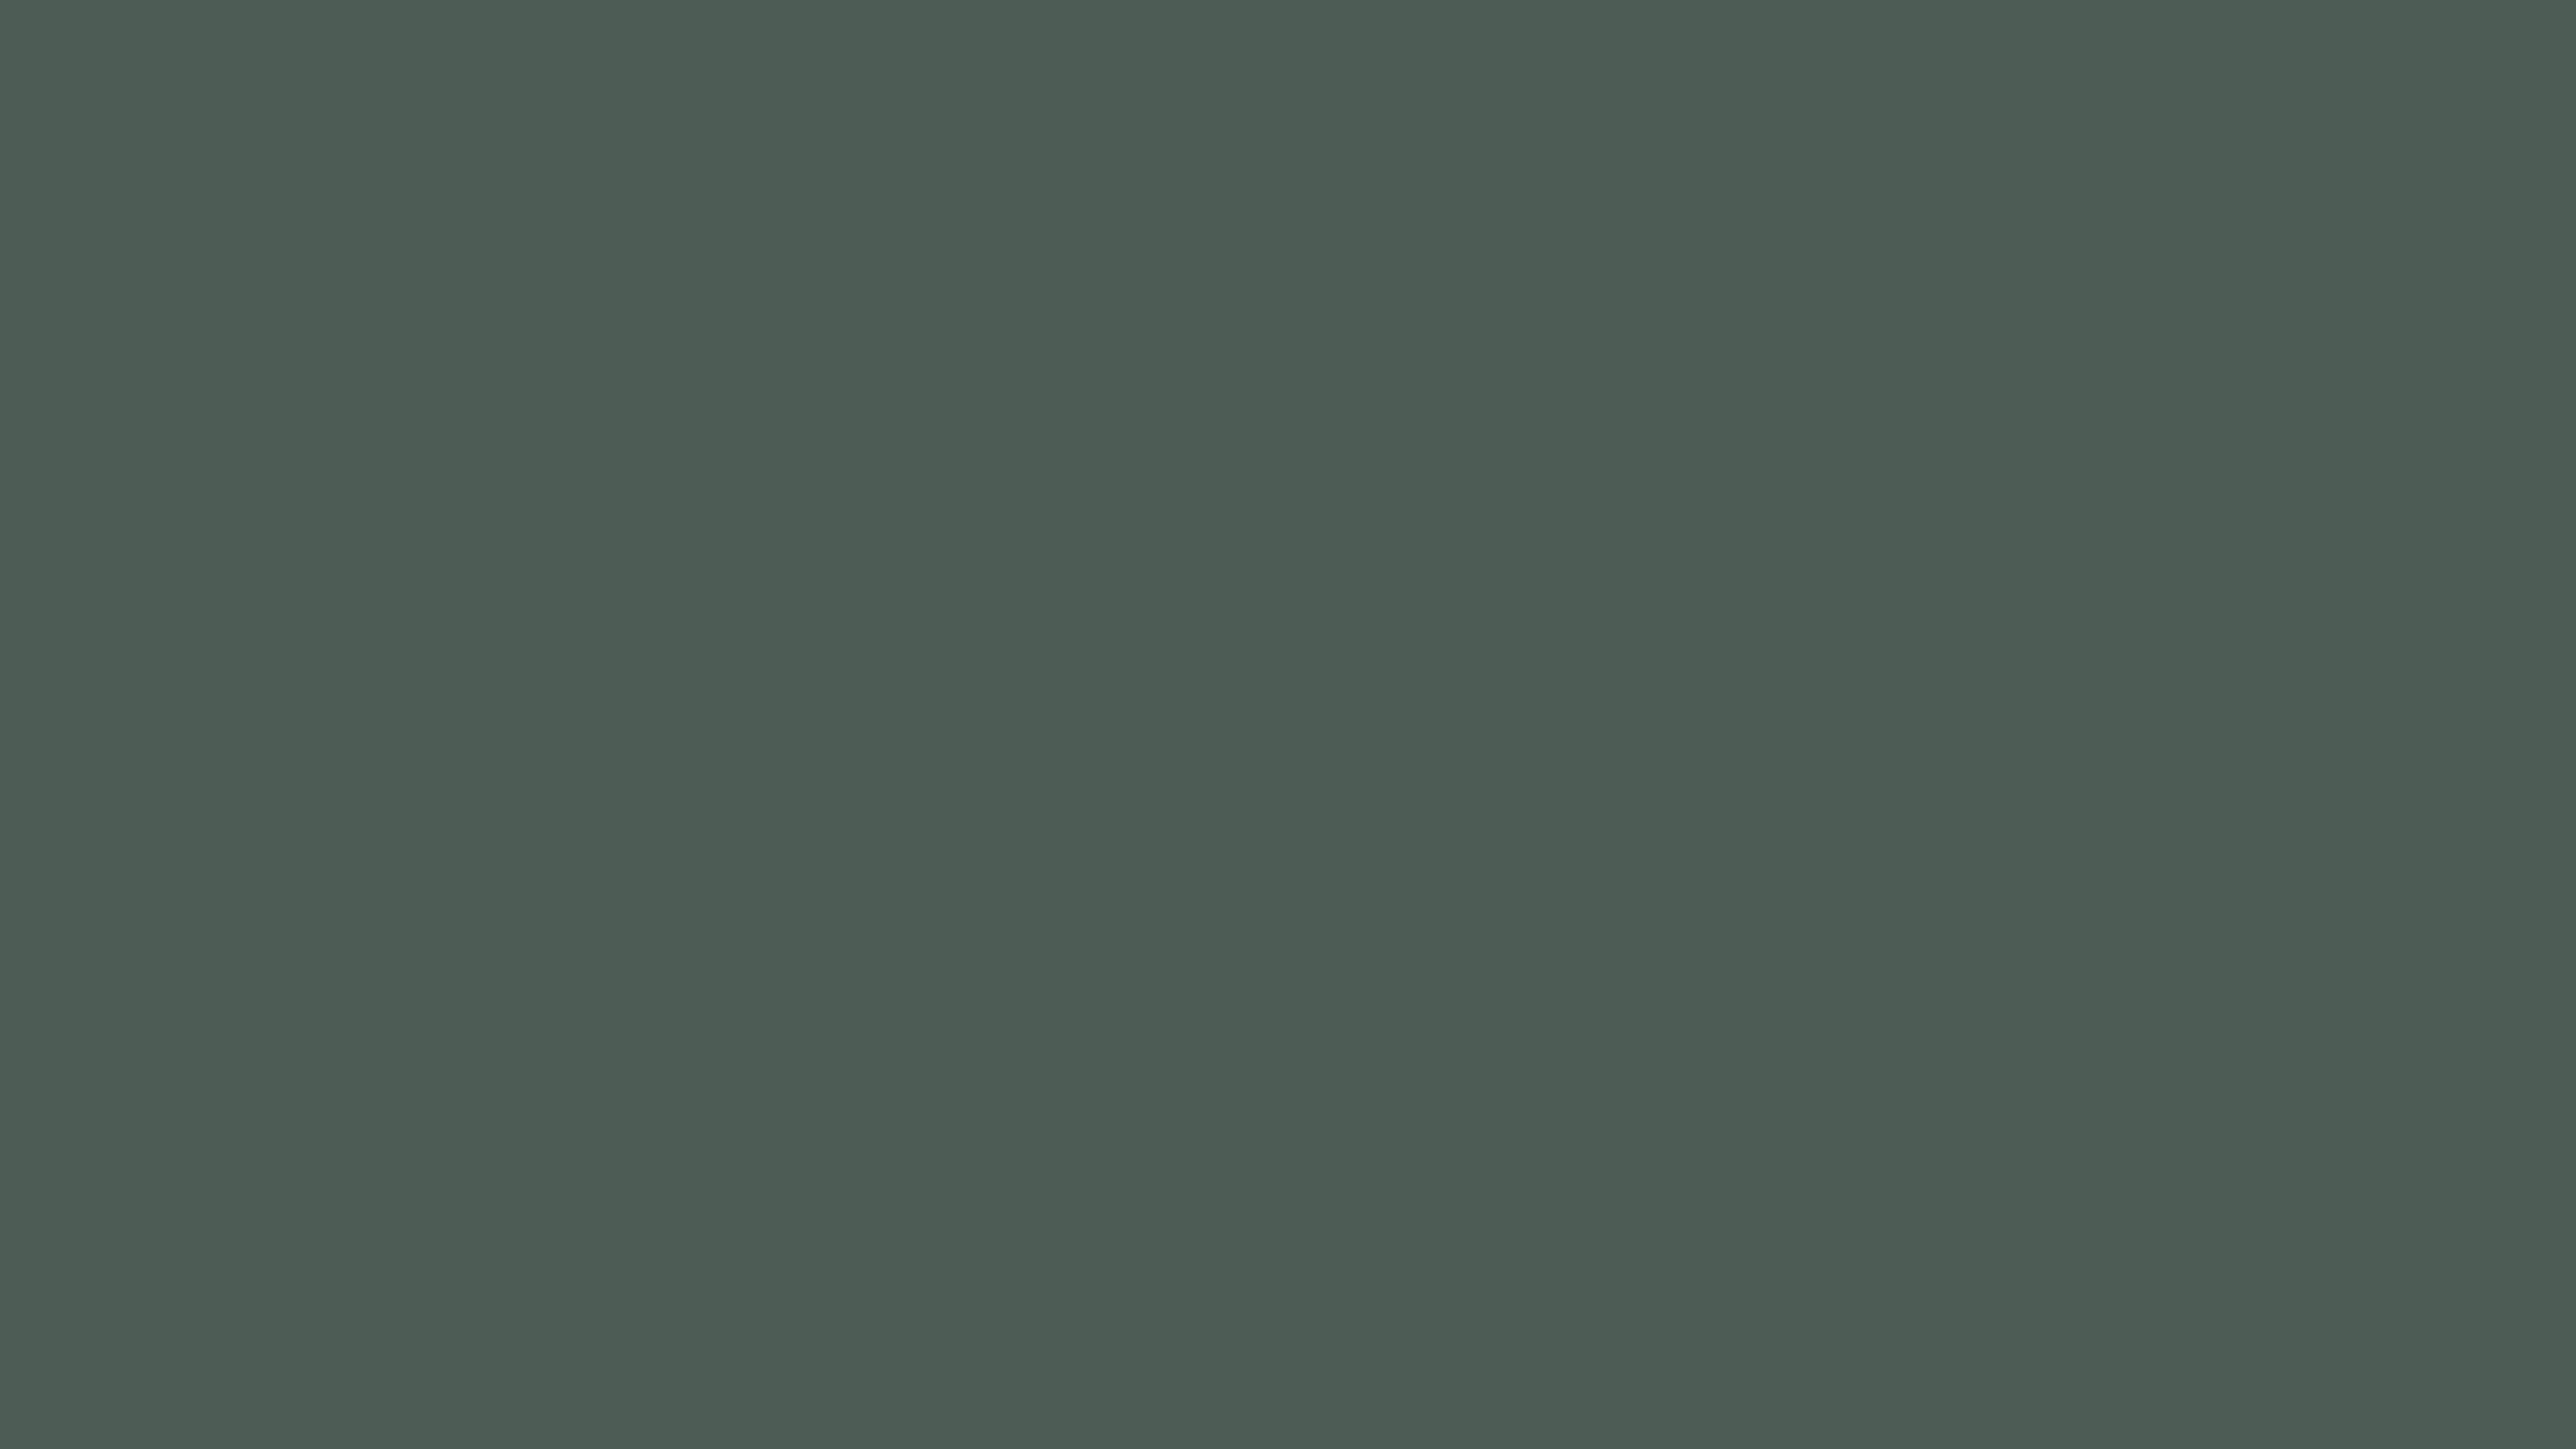 5120x2880 Feldgrau Solid Color Background